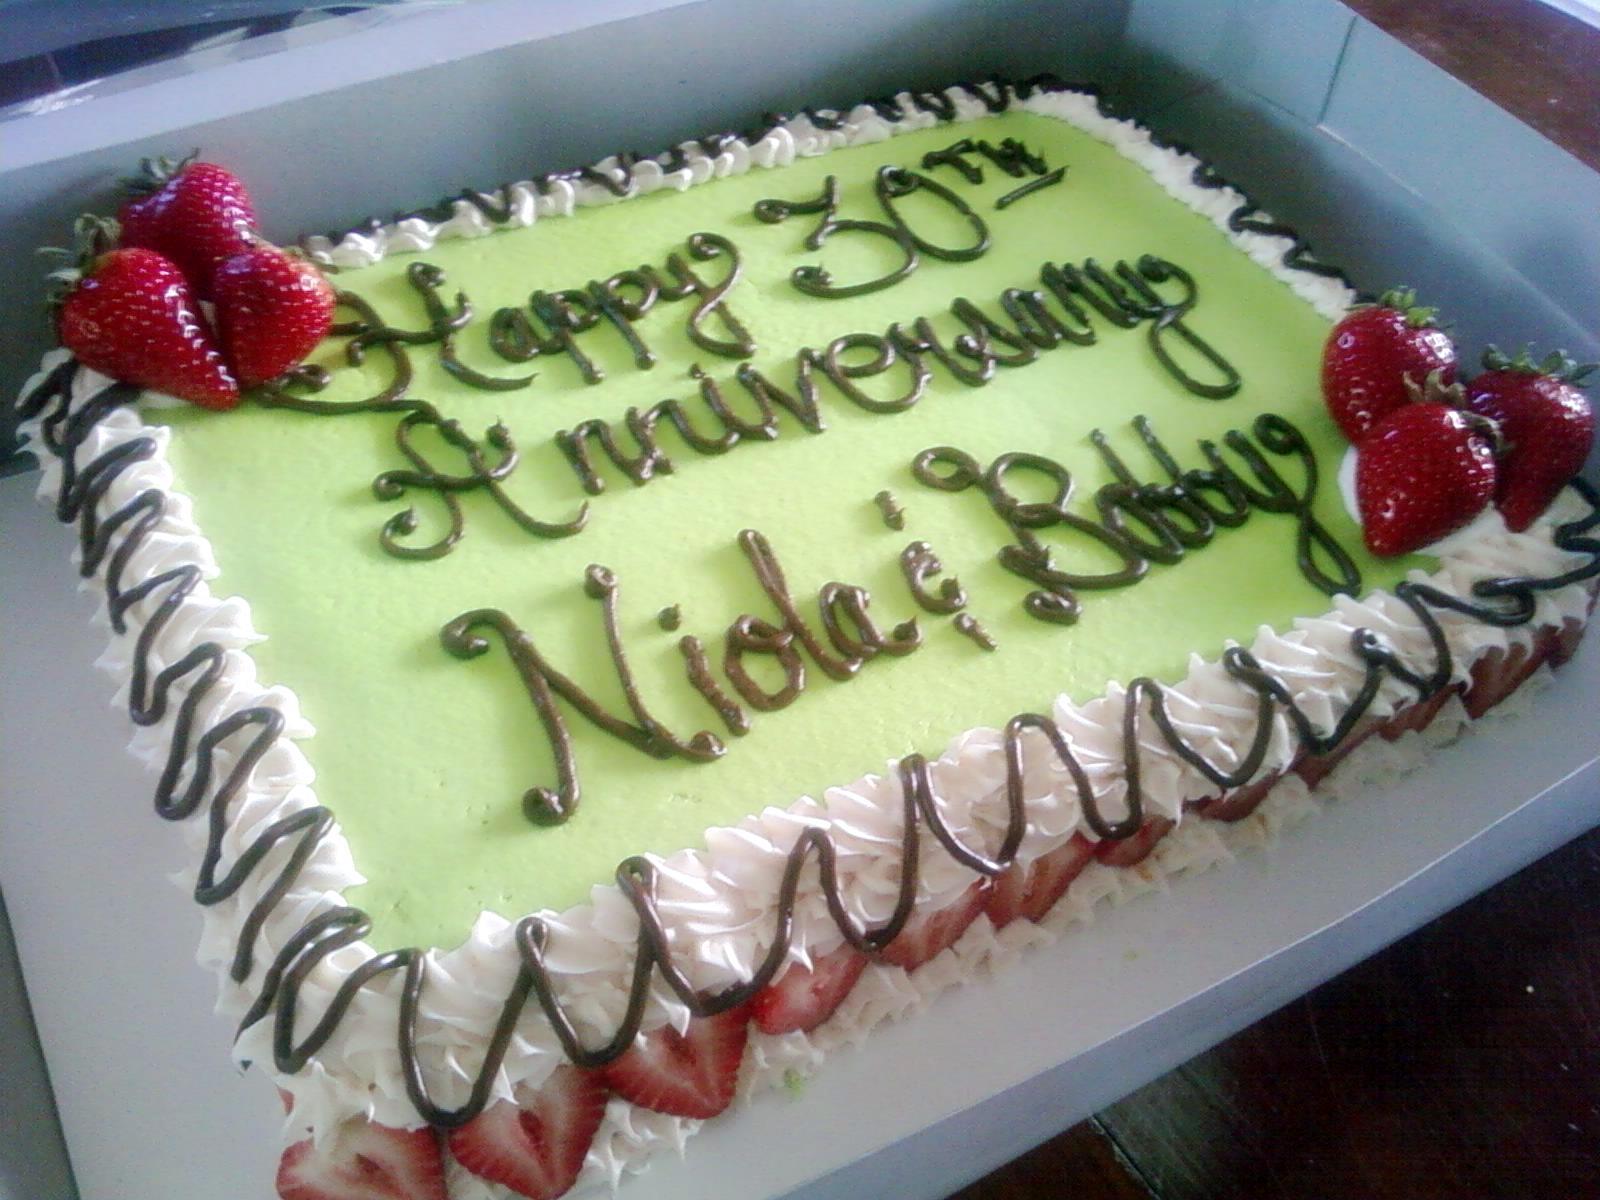 http://2.bp.blogspot.com/_r4c80ZXXzGo/S8zCyULmnTI/AAAAAAAABEo/oM3ei1vErAw/s1600/Niola_Bobby_Anniversary_Cake.jpg